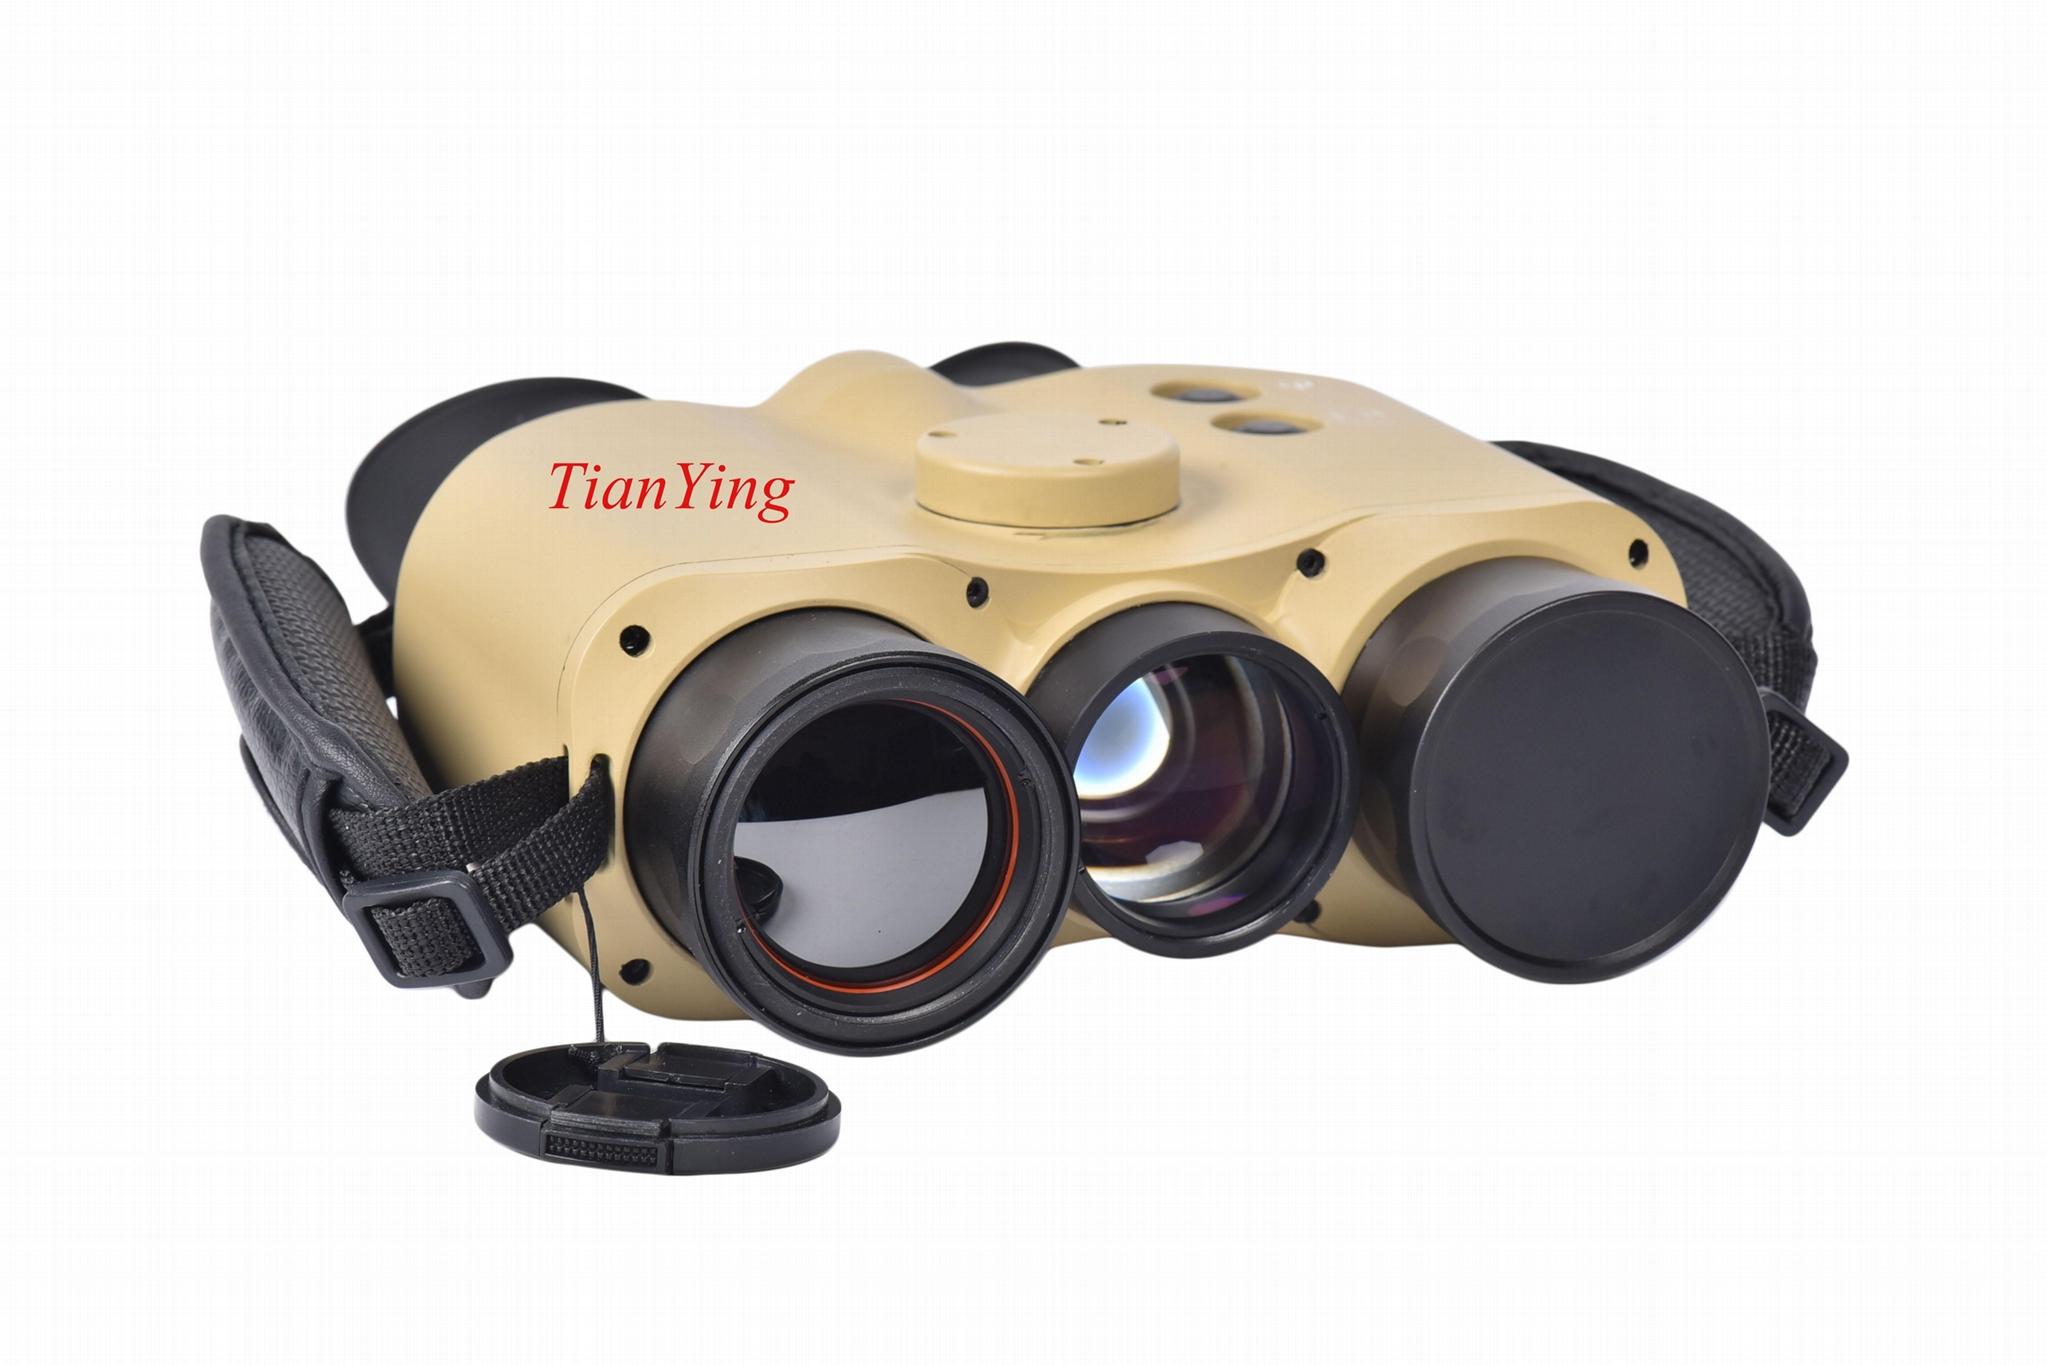 1.2kg Weight IP67 Military Handheld Thermal Imaging Binocular for Sniper-Solider